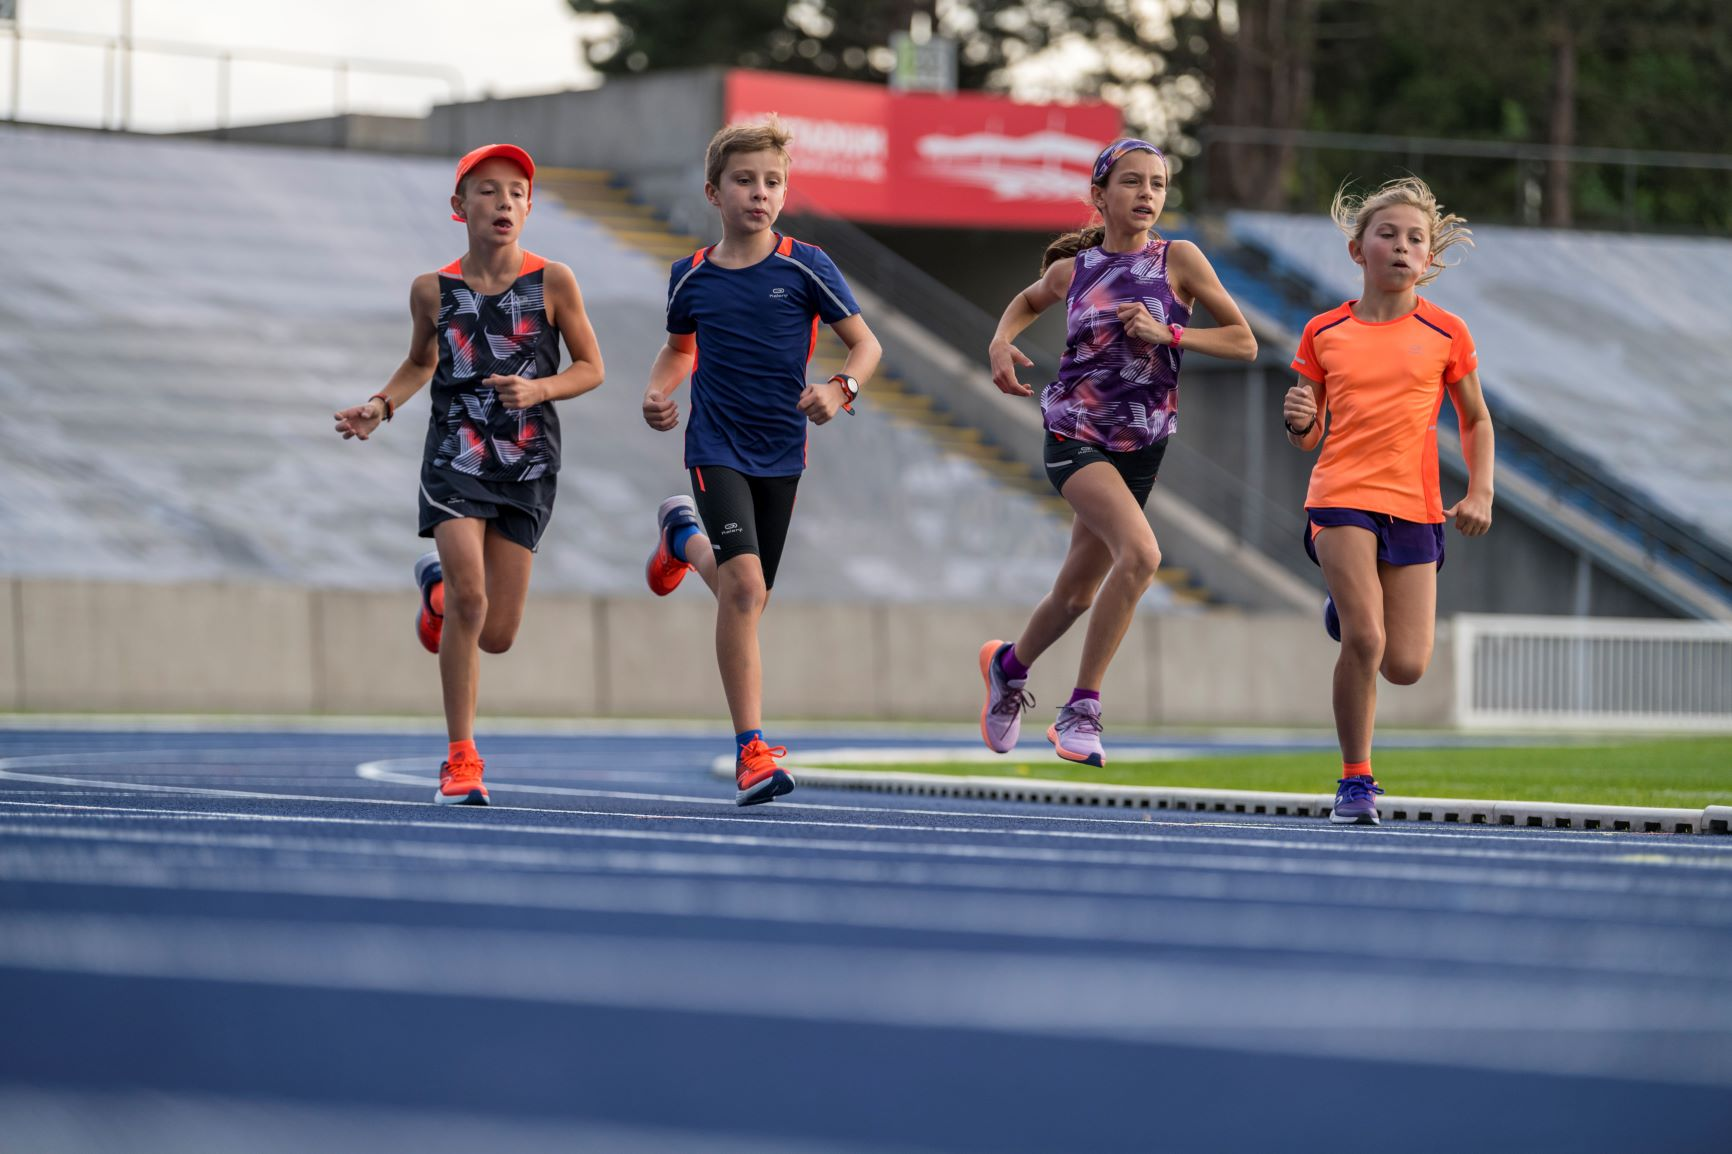 When Should Kids Start Running?